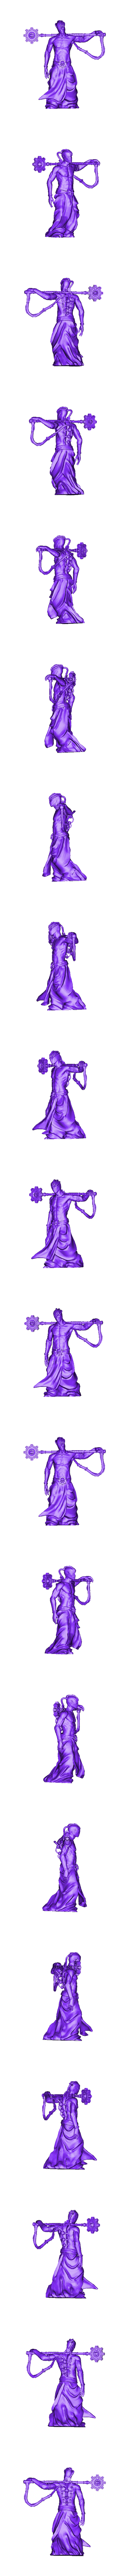 Fulgurite_5.stl Download free STL file Martian Electric Clergy • 3D print design, ErikTheHeretek